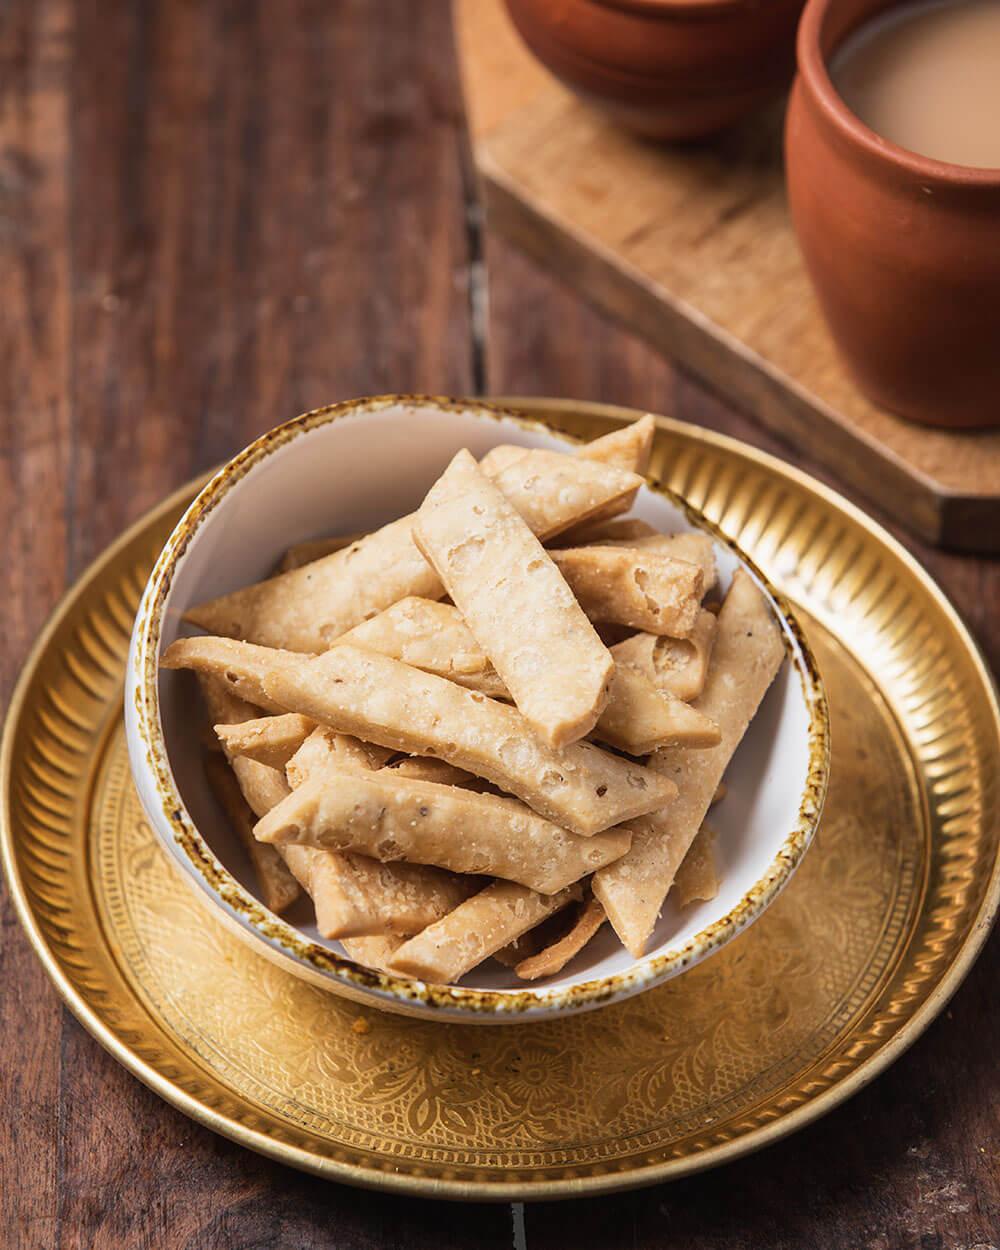 Wheat Namakpara